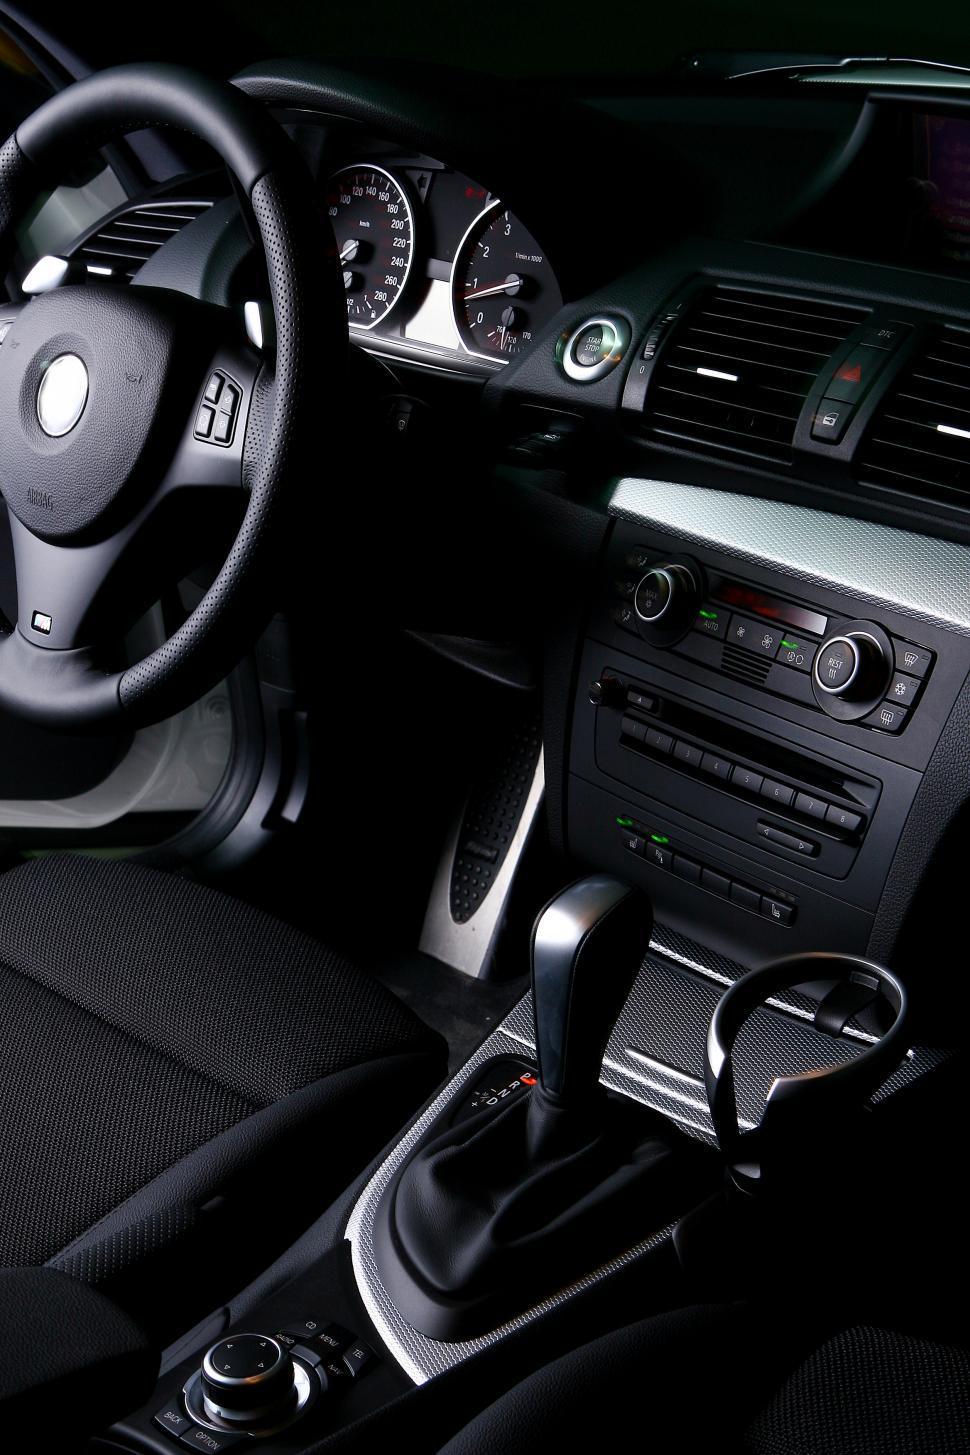 Download Free Stock Photo of plush car interior in black